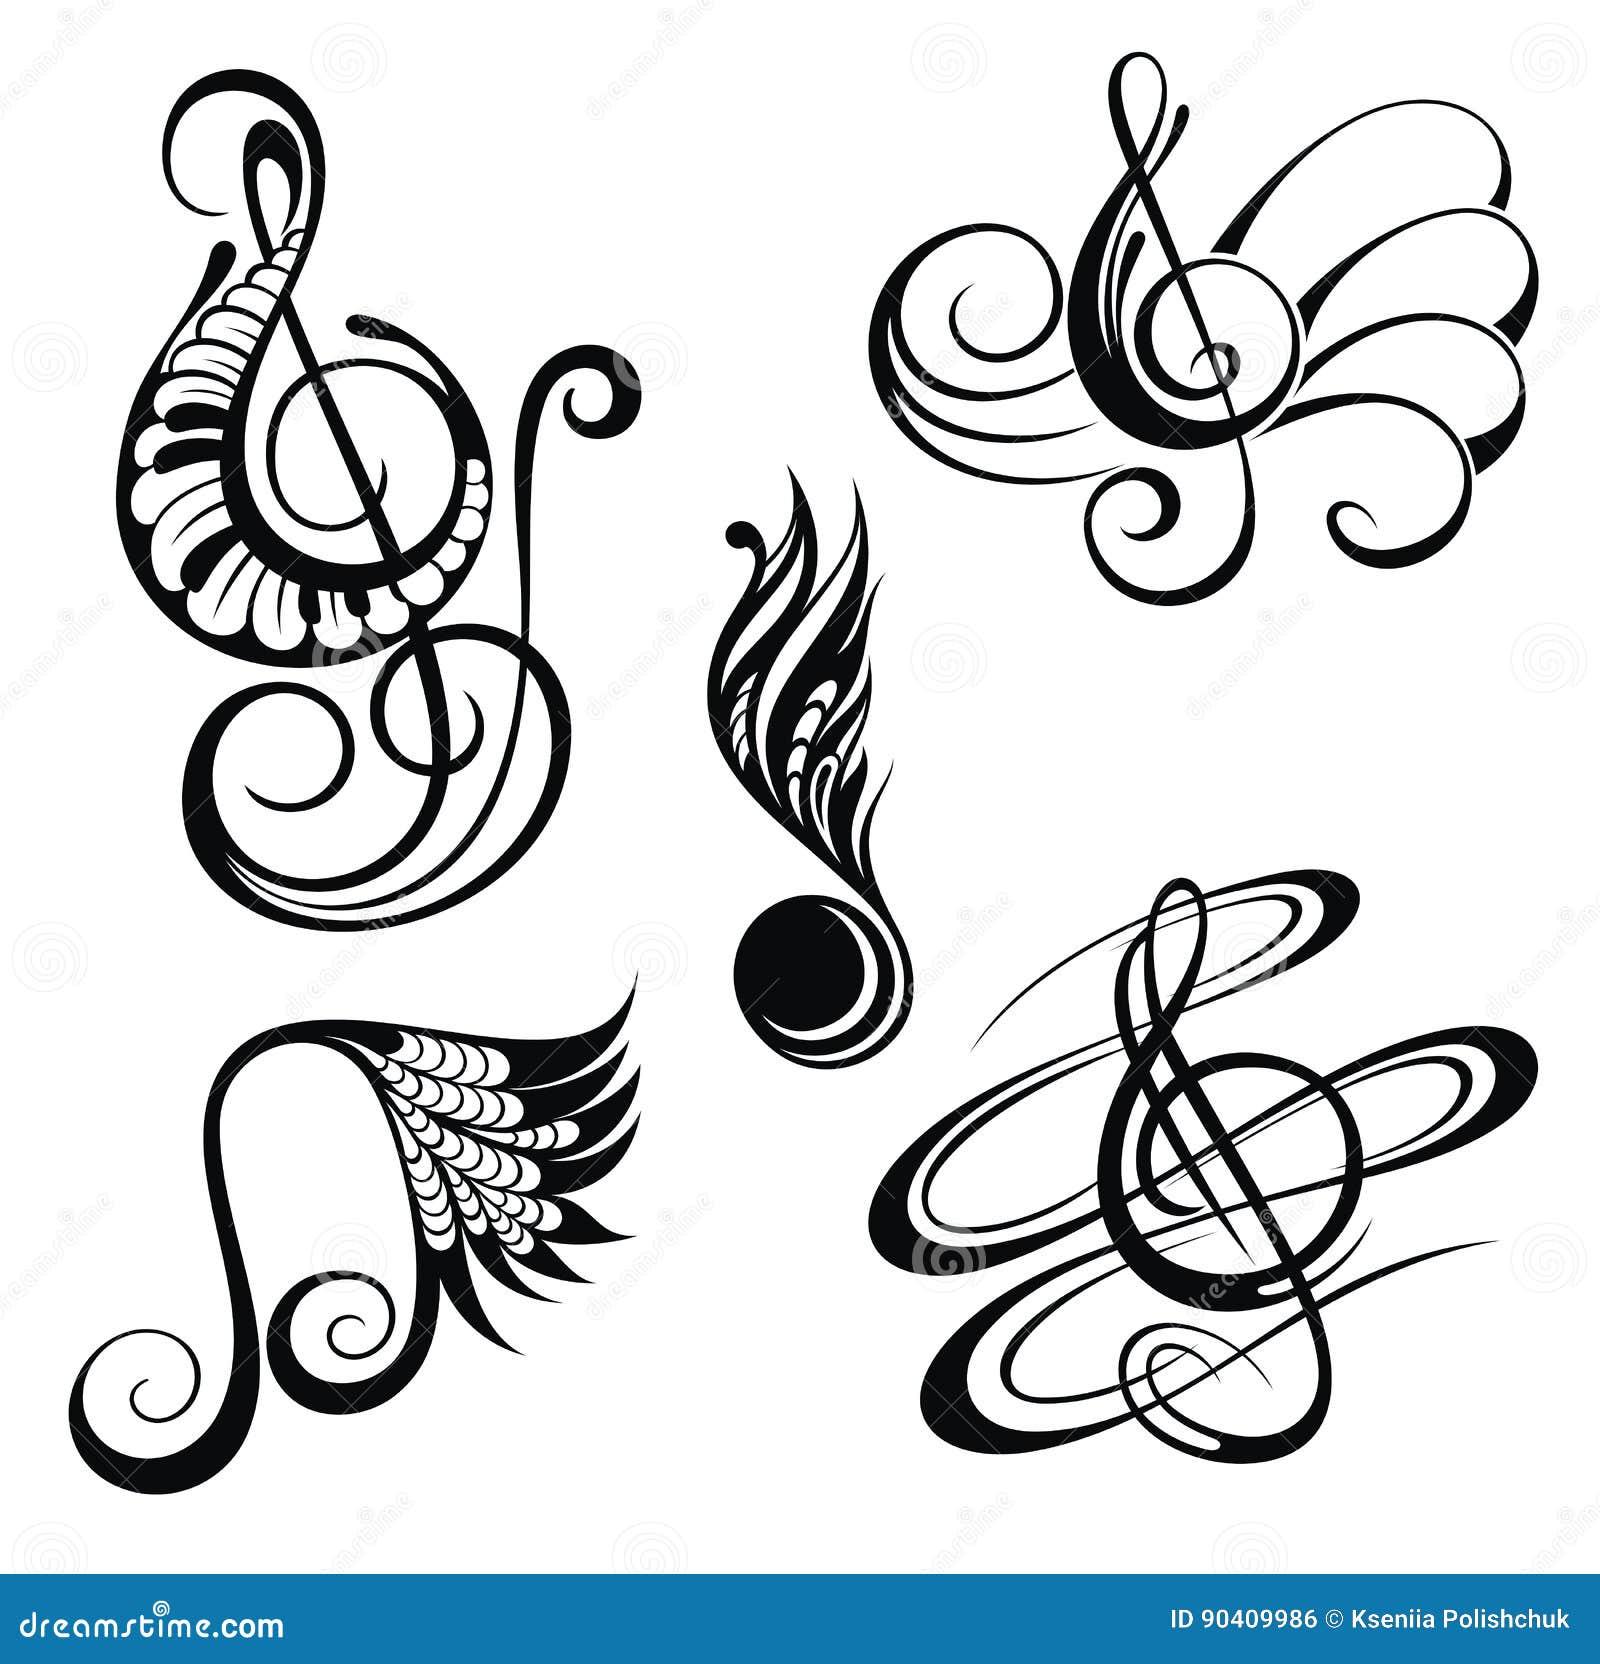 Music notes. Vector illustration